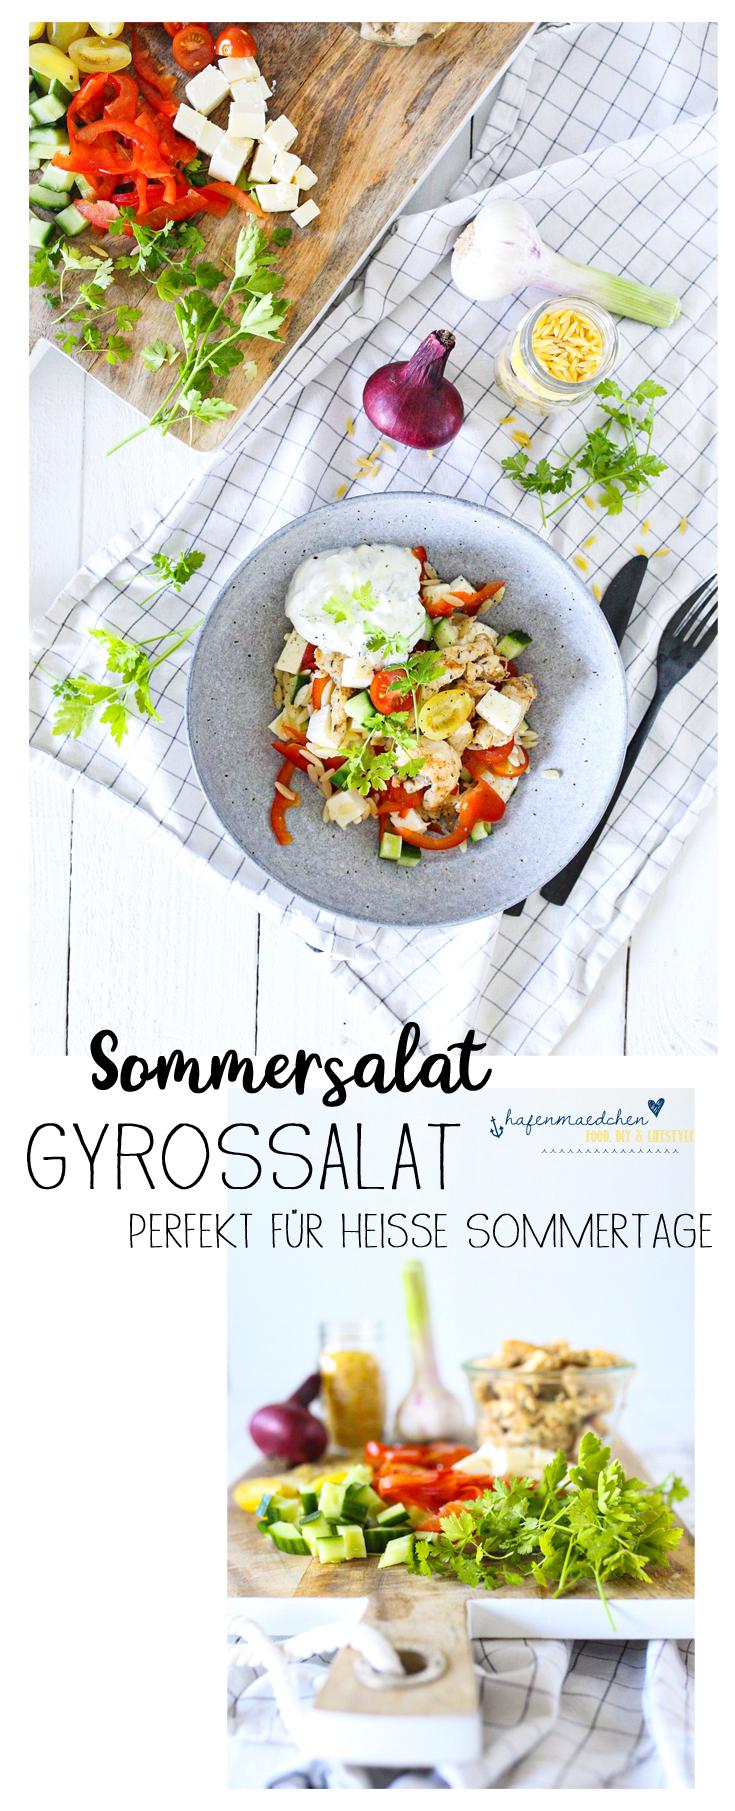 gyrossalat-sommersalat- Pinterest Pin